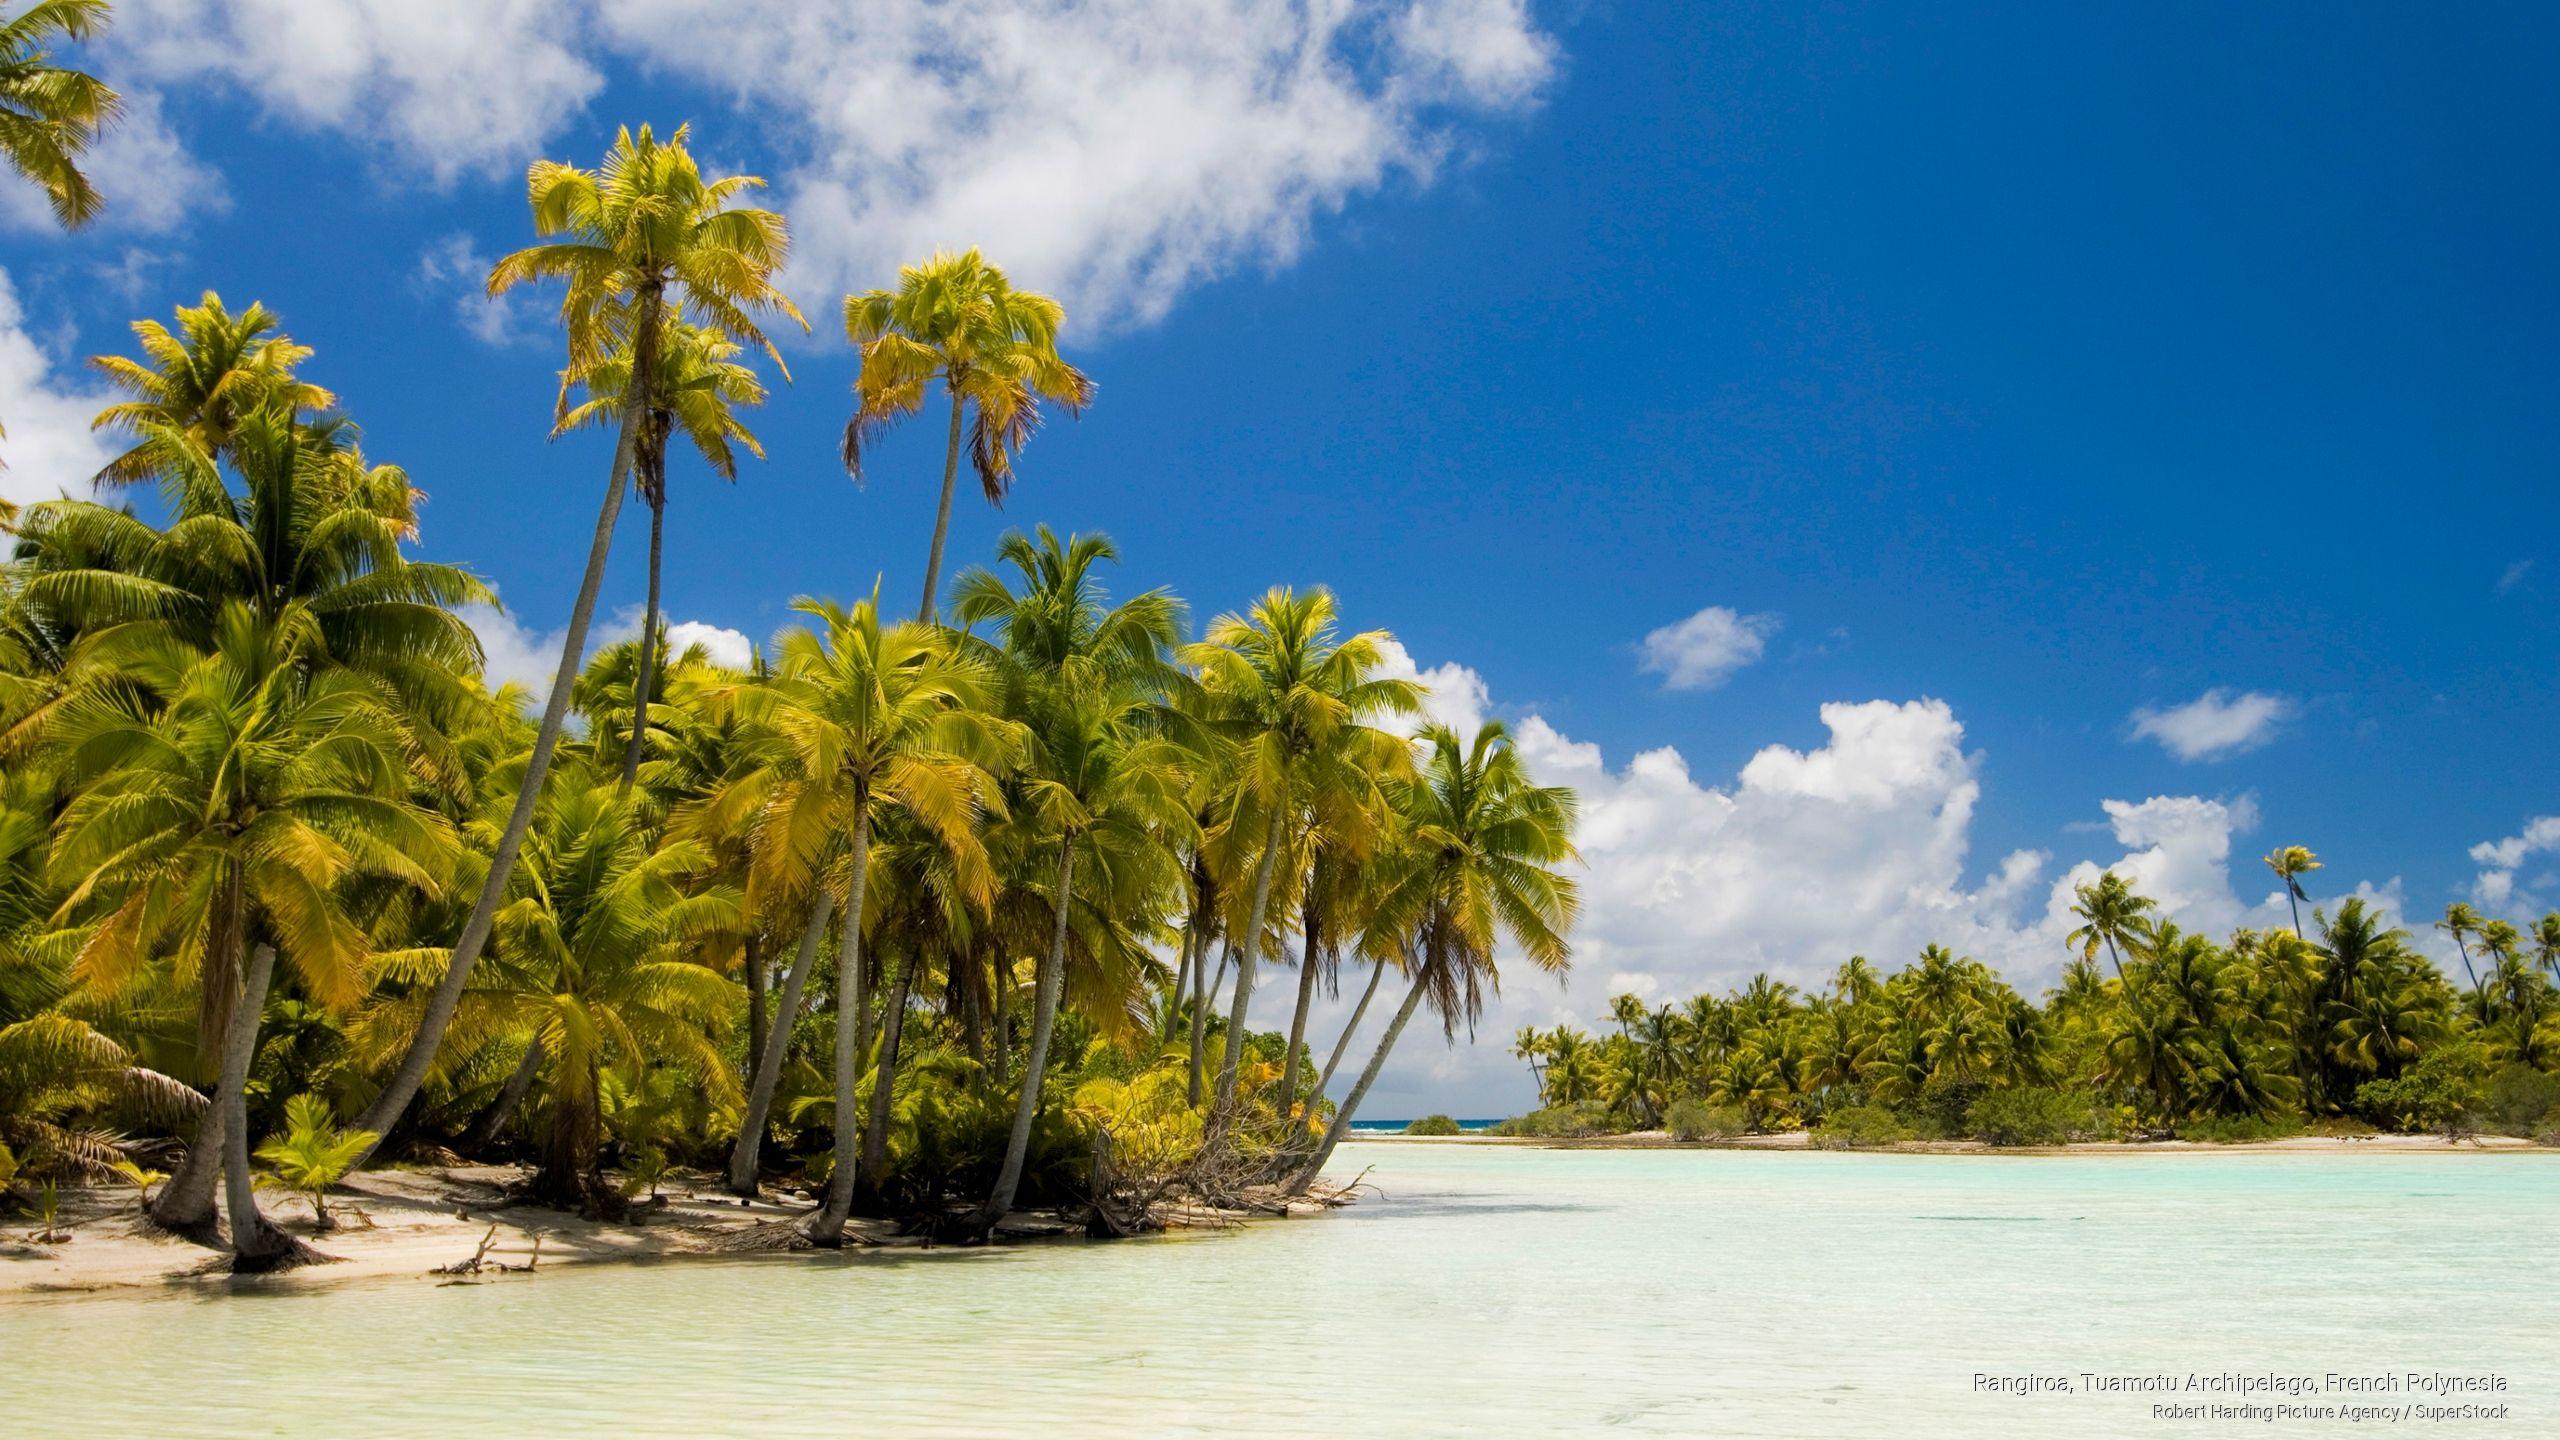 Rangiroa, Tuamotu Archipelago, French Polynesia